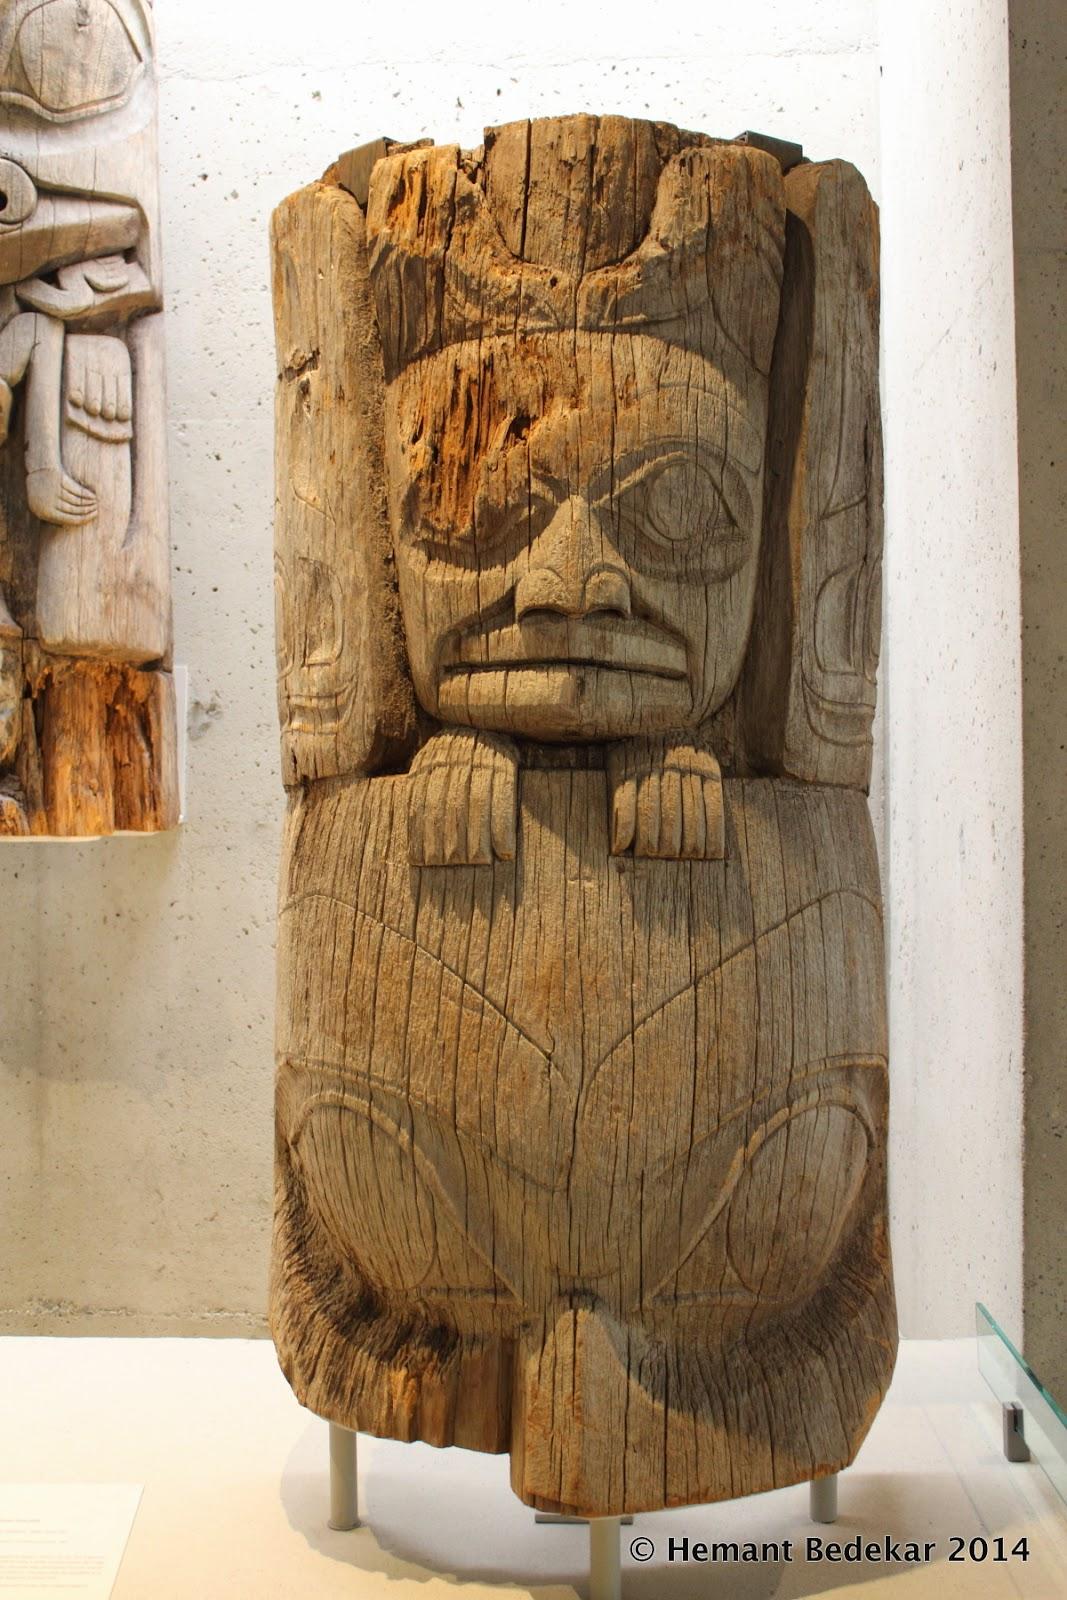 Totem Poles at University of British Columbia - Museum of Anthropology